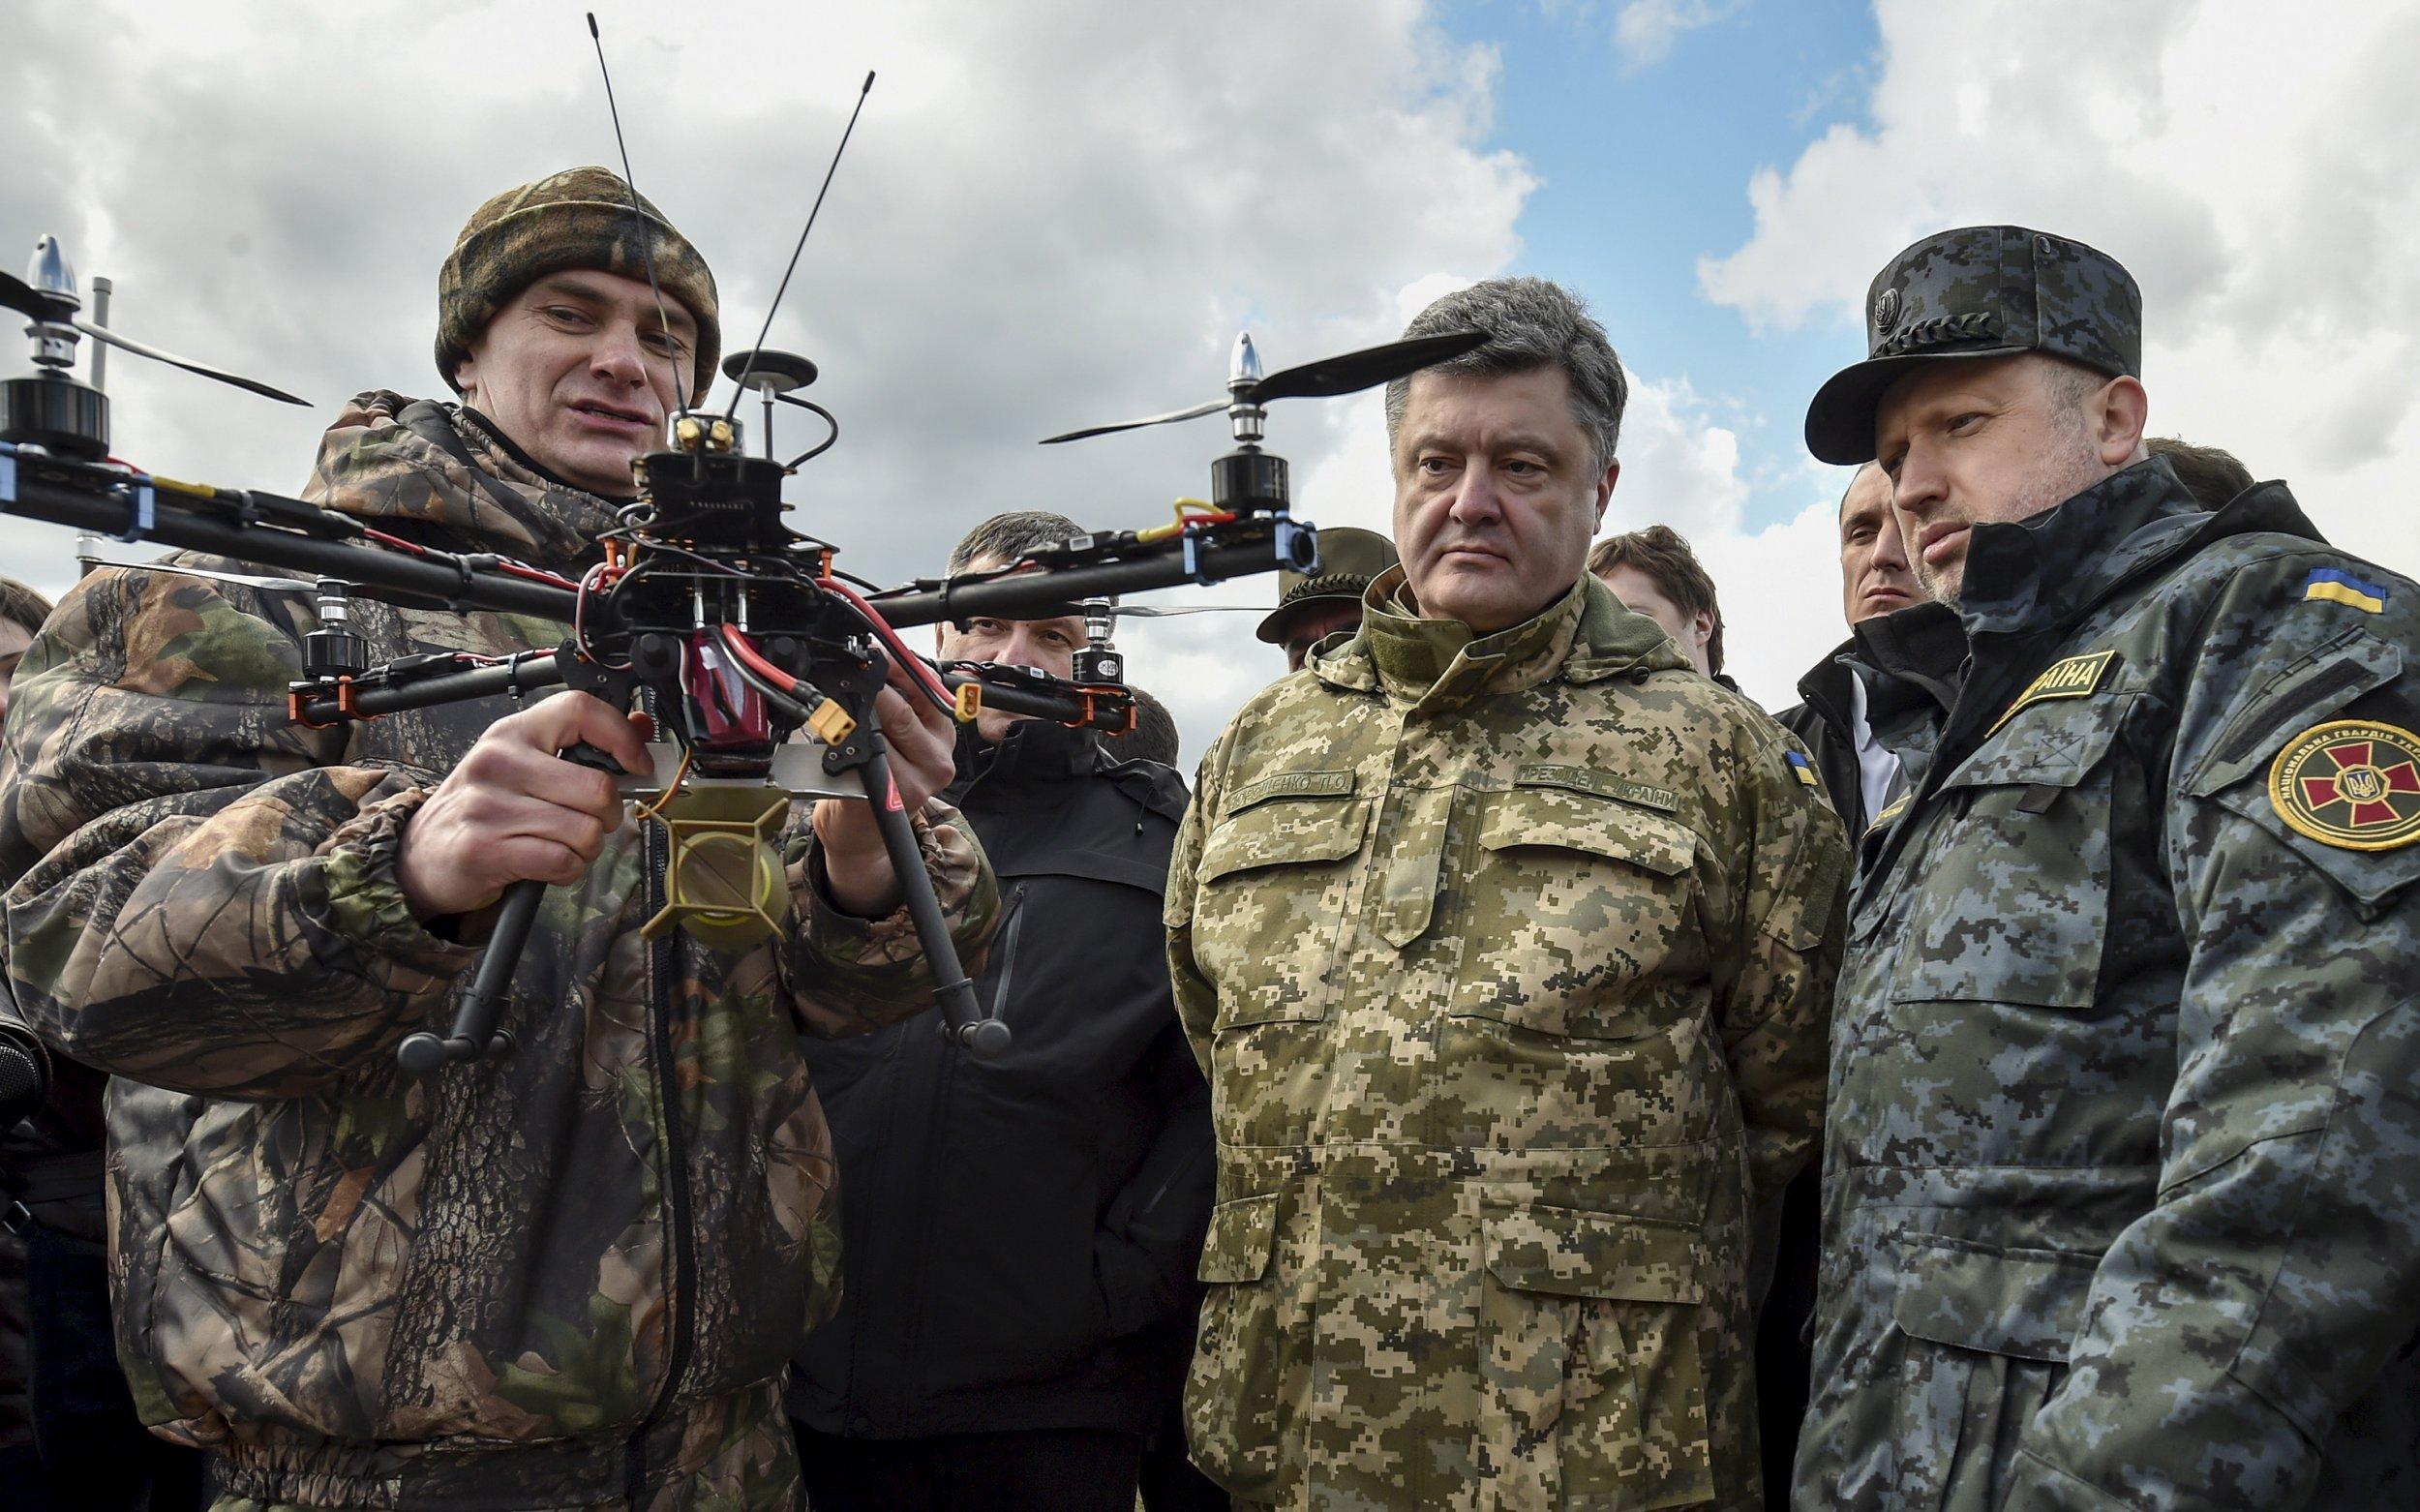 2015-04-09T151702Z_2_LYNXMPEB380QH_RTROPTP_4_UKRAINE-CRISIS